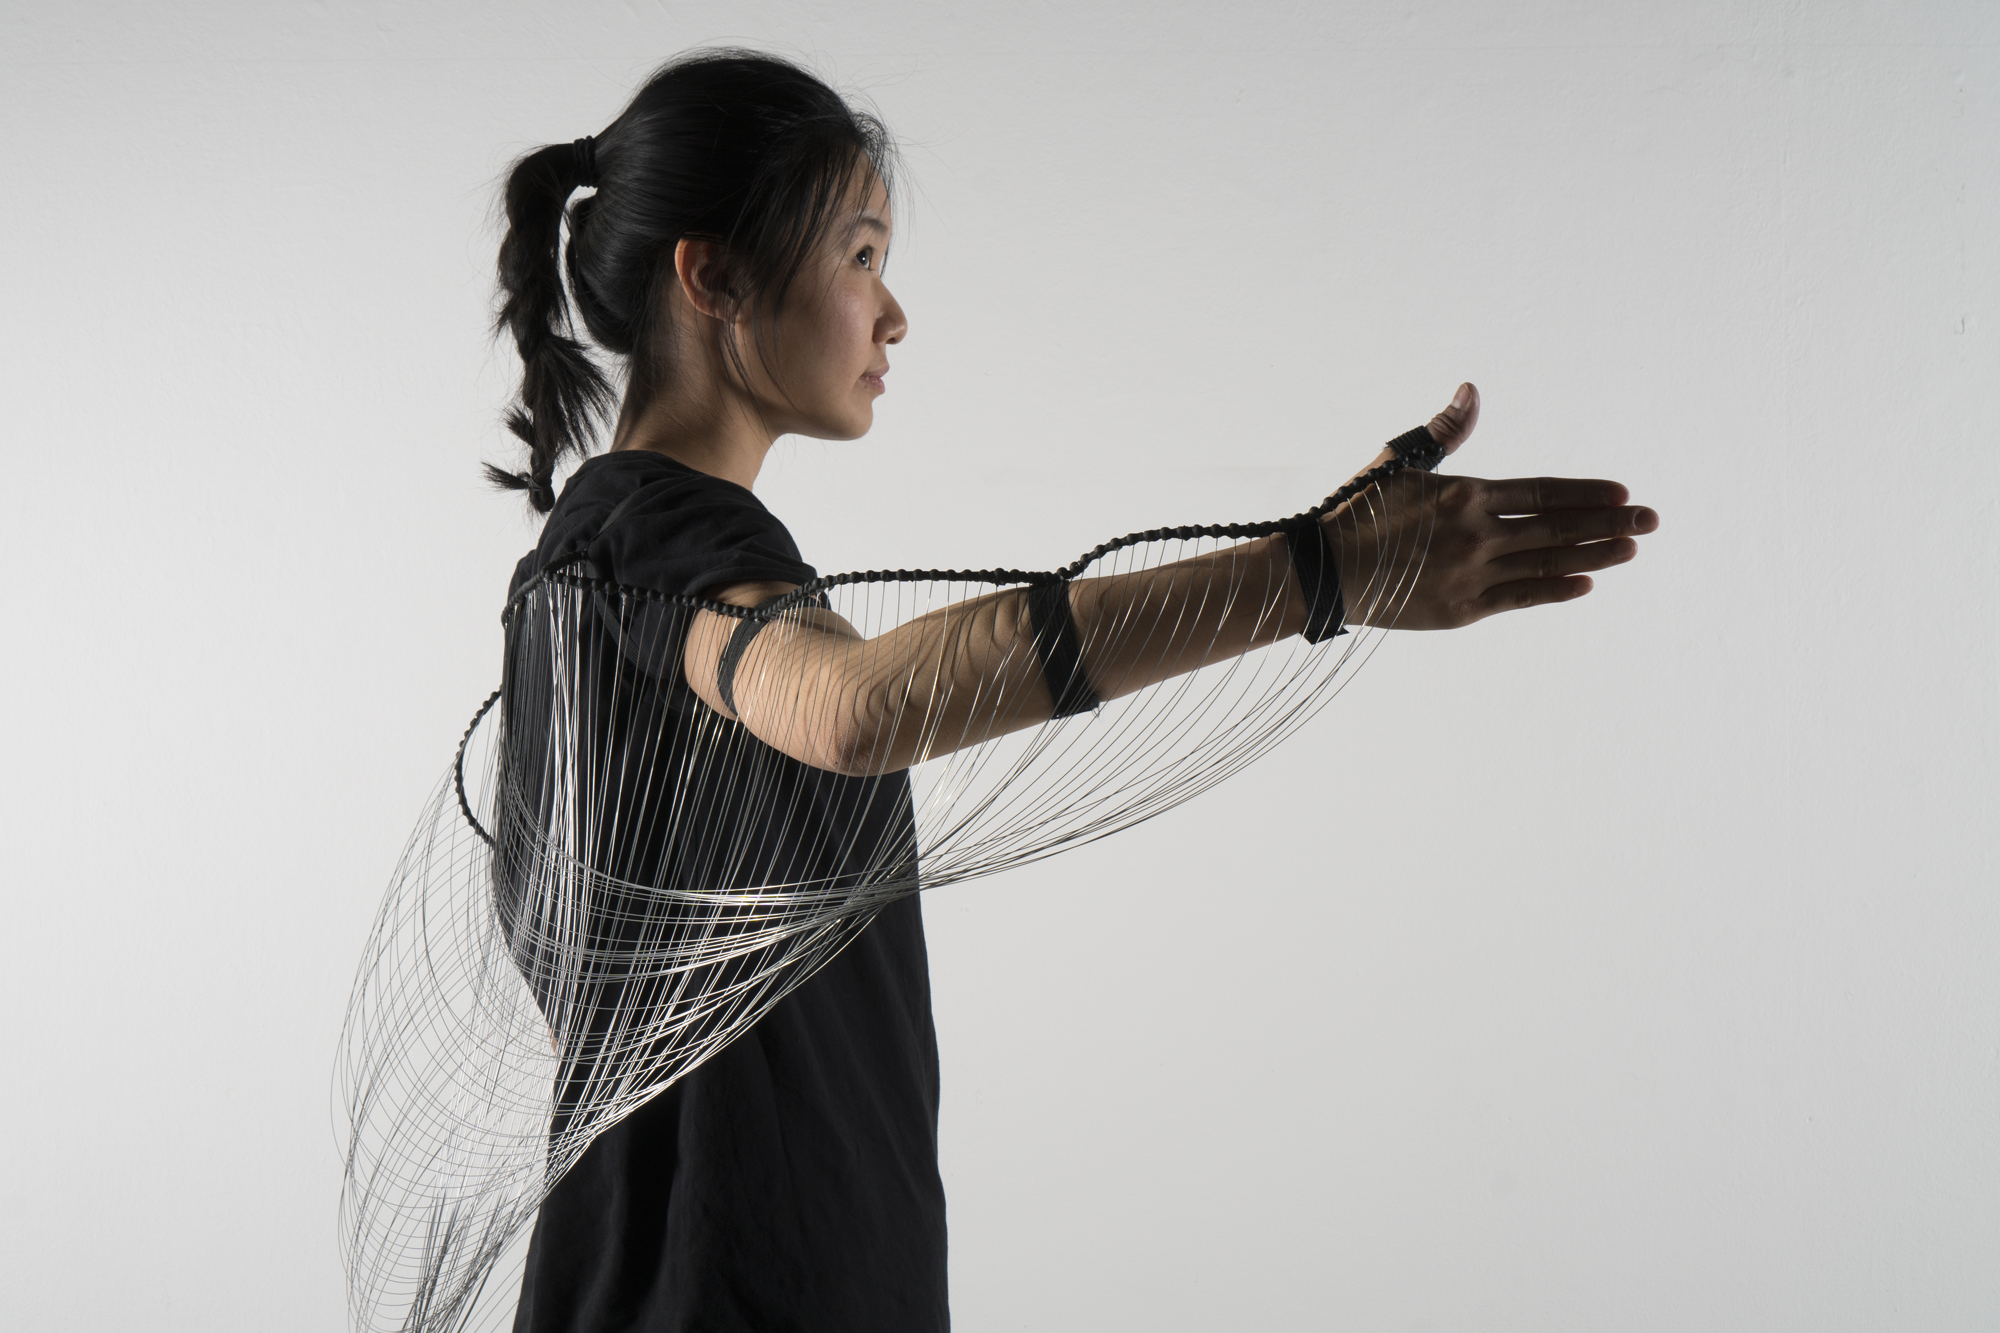 Phase 4 - Hybride - konfrontatives Experiment - Maskierung Autoren: Yue Qi & Qixin Chen Photo: J. Cafuk / Y. Kaiser